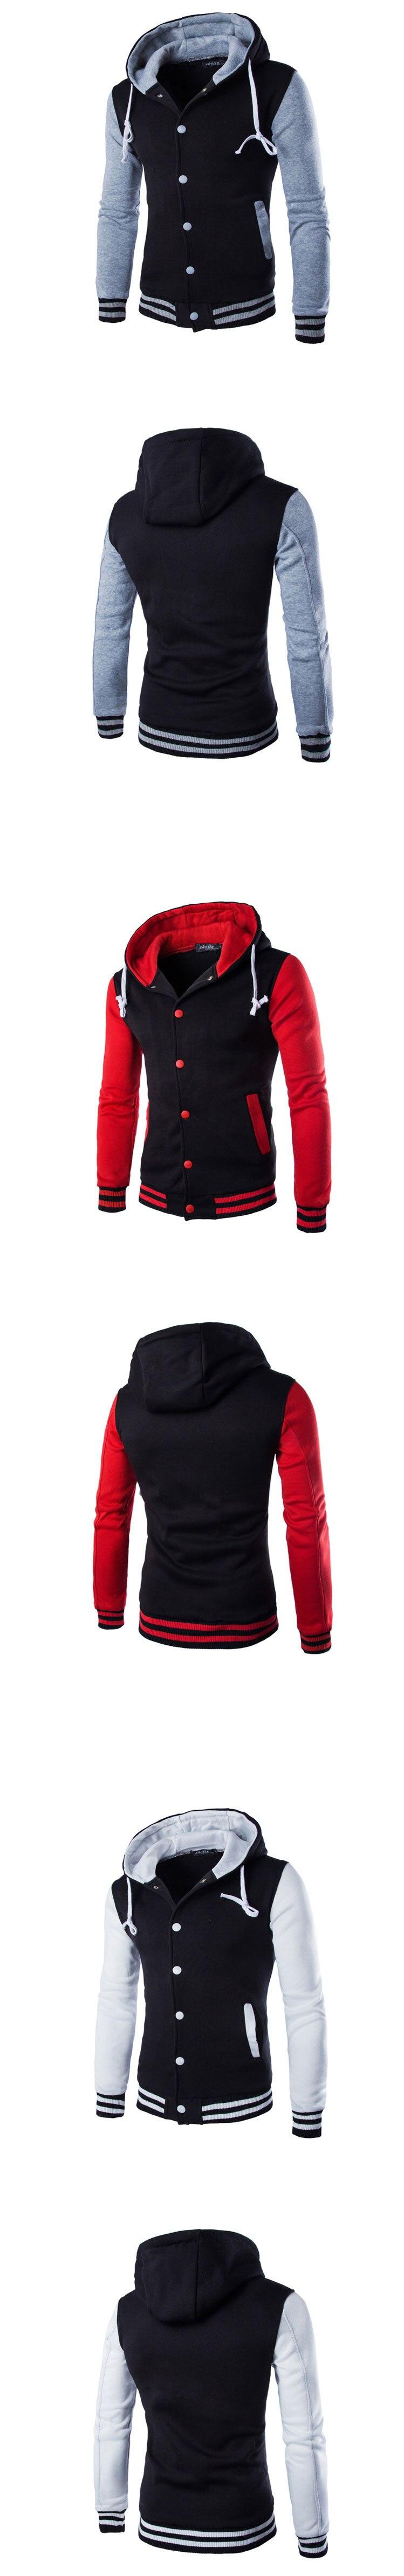 HTB1dtjwfnlYBeNjSszcq6zwhFXaK Mens Hoodie Baseball Jacket Men 2018 Fashion Design Black Mens Slim Fit Varsity Jacket Brand Stylish College Jacekt Veste Homme